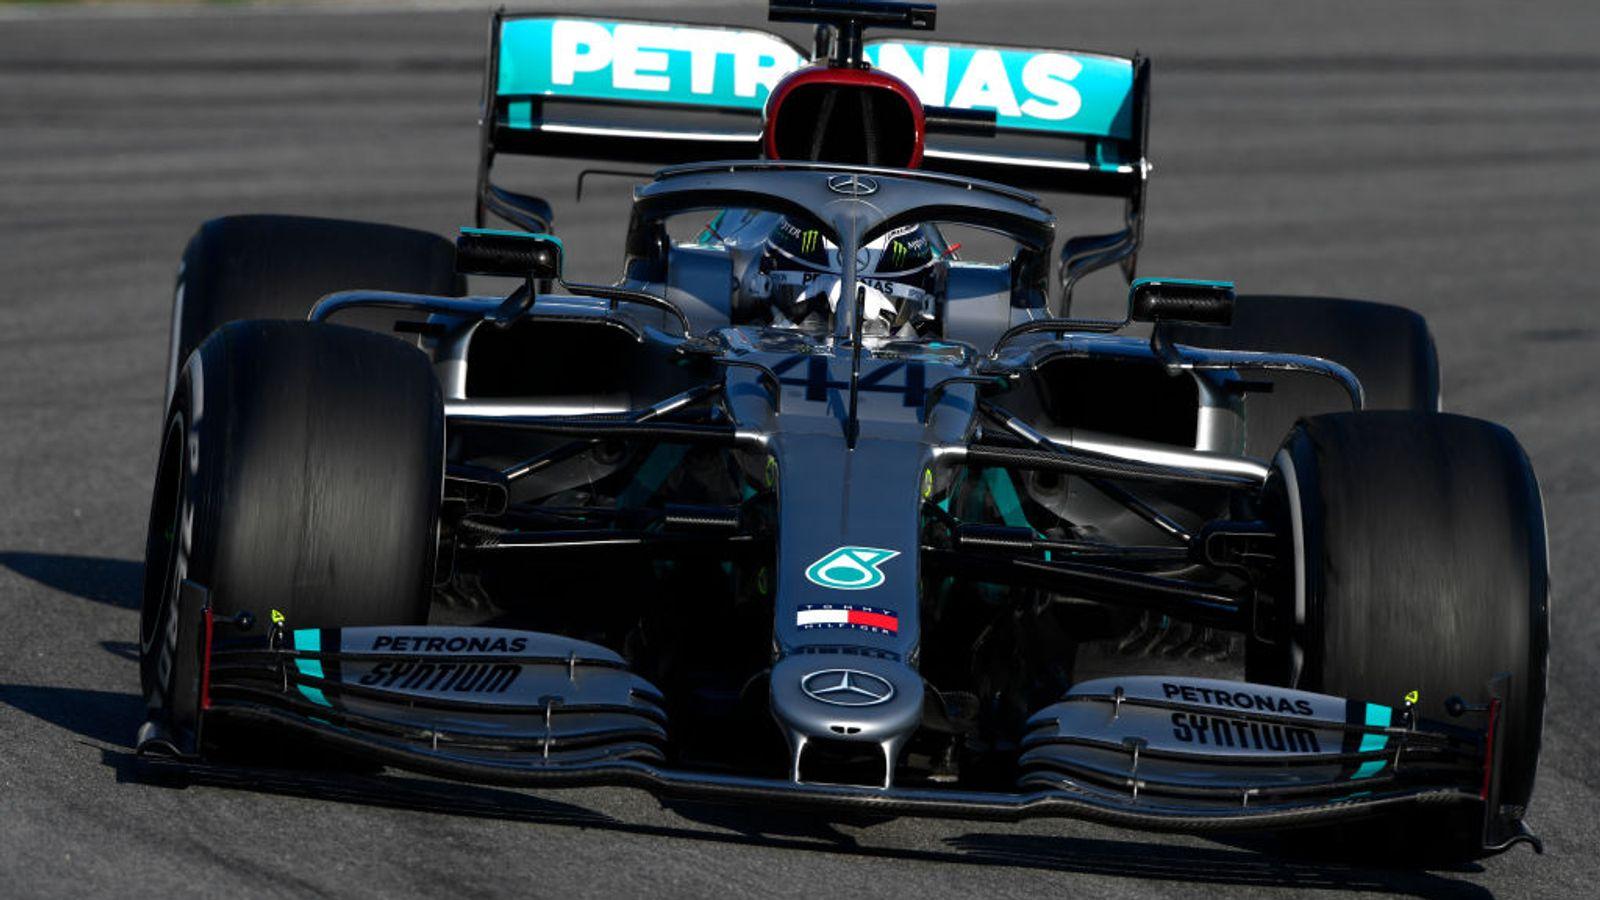 Mercedes' DAS wheel innovation: The 'trombone' sparks F1 intrigue